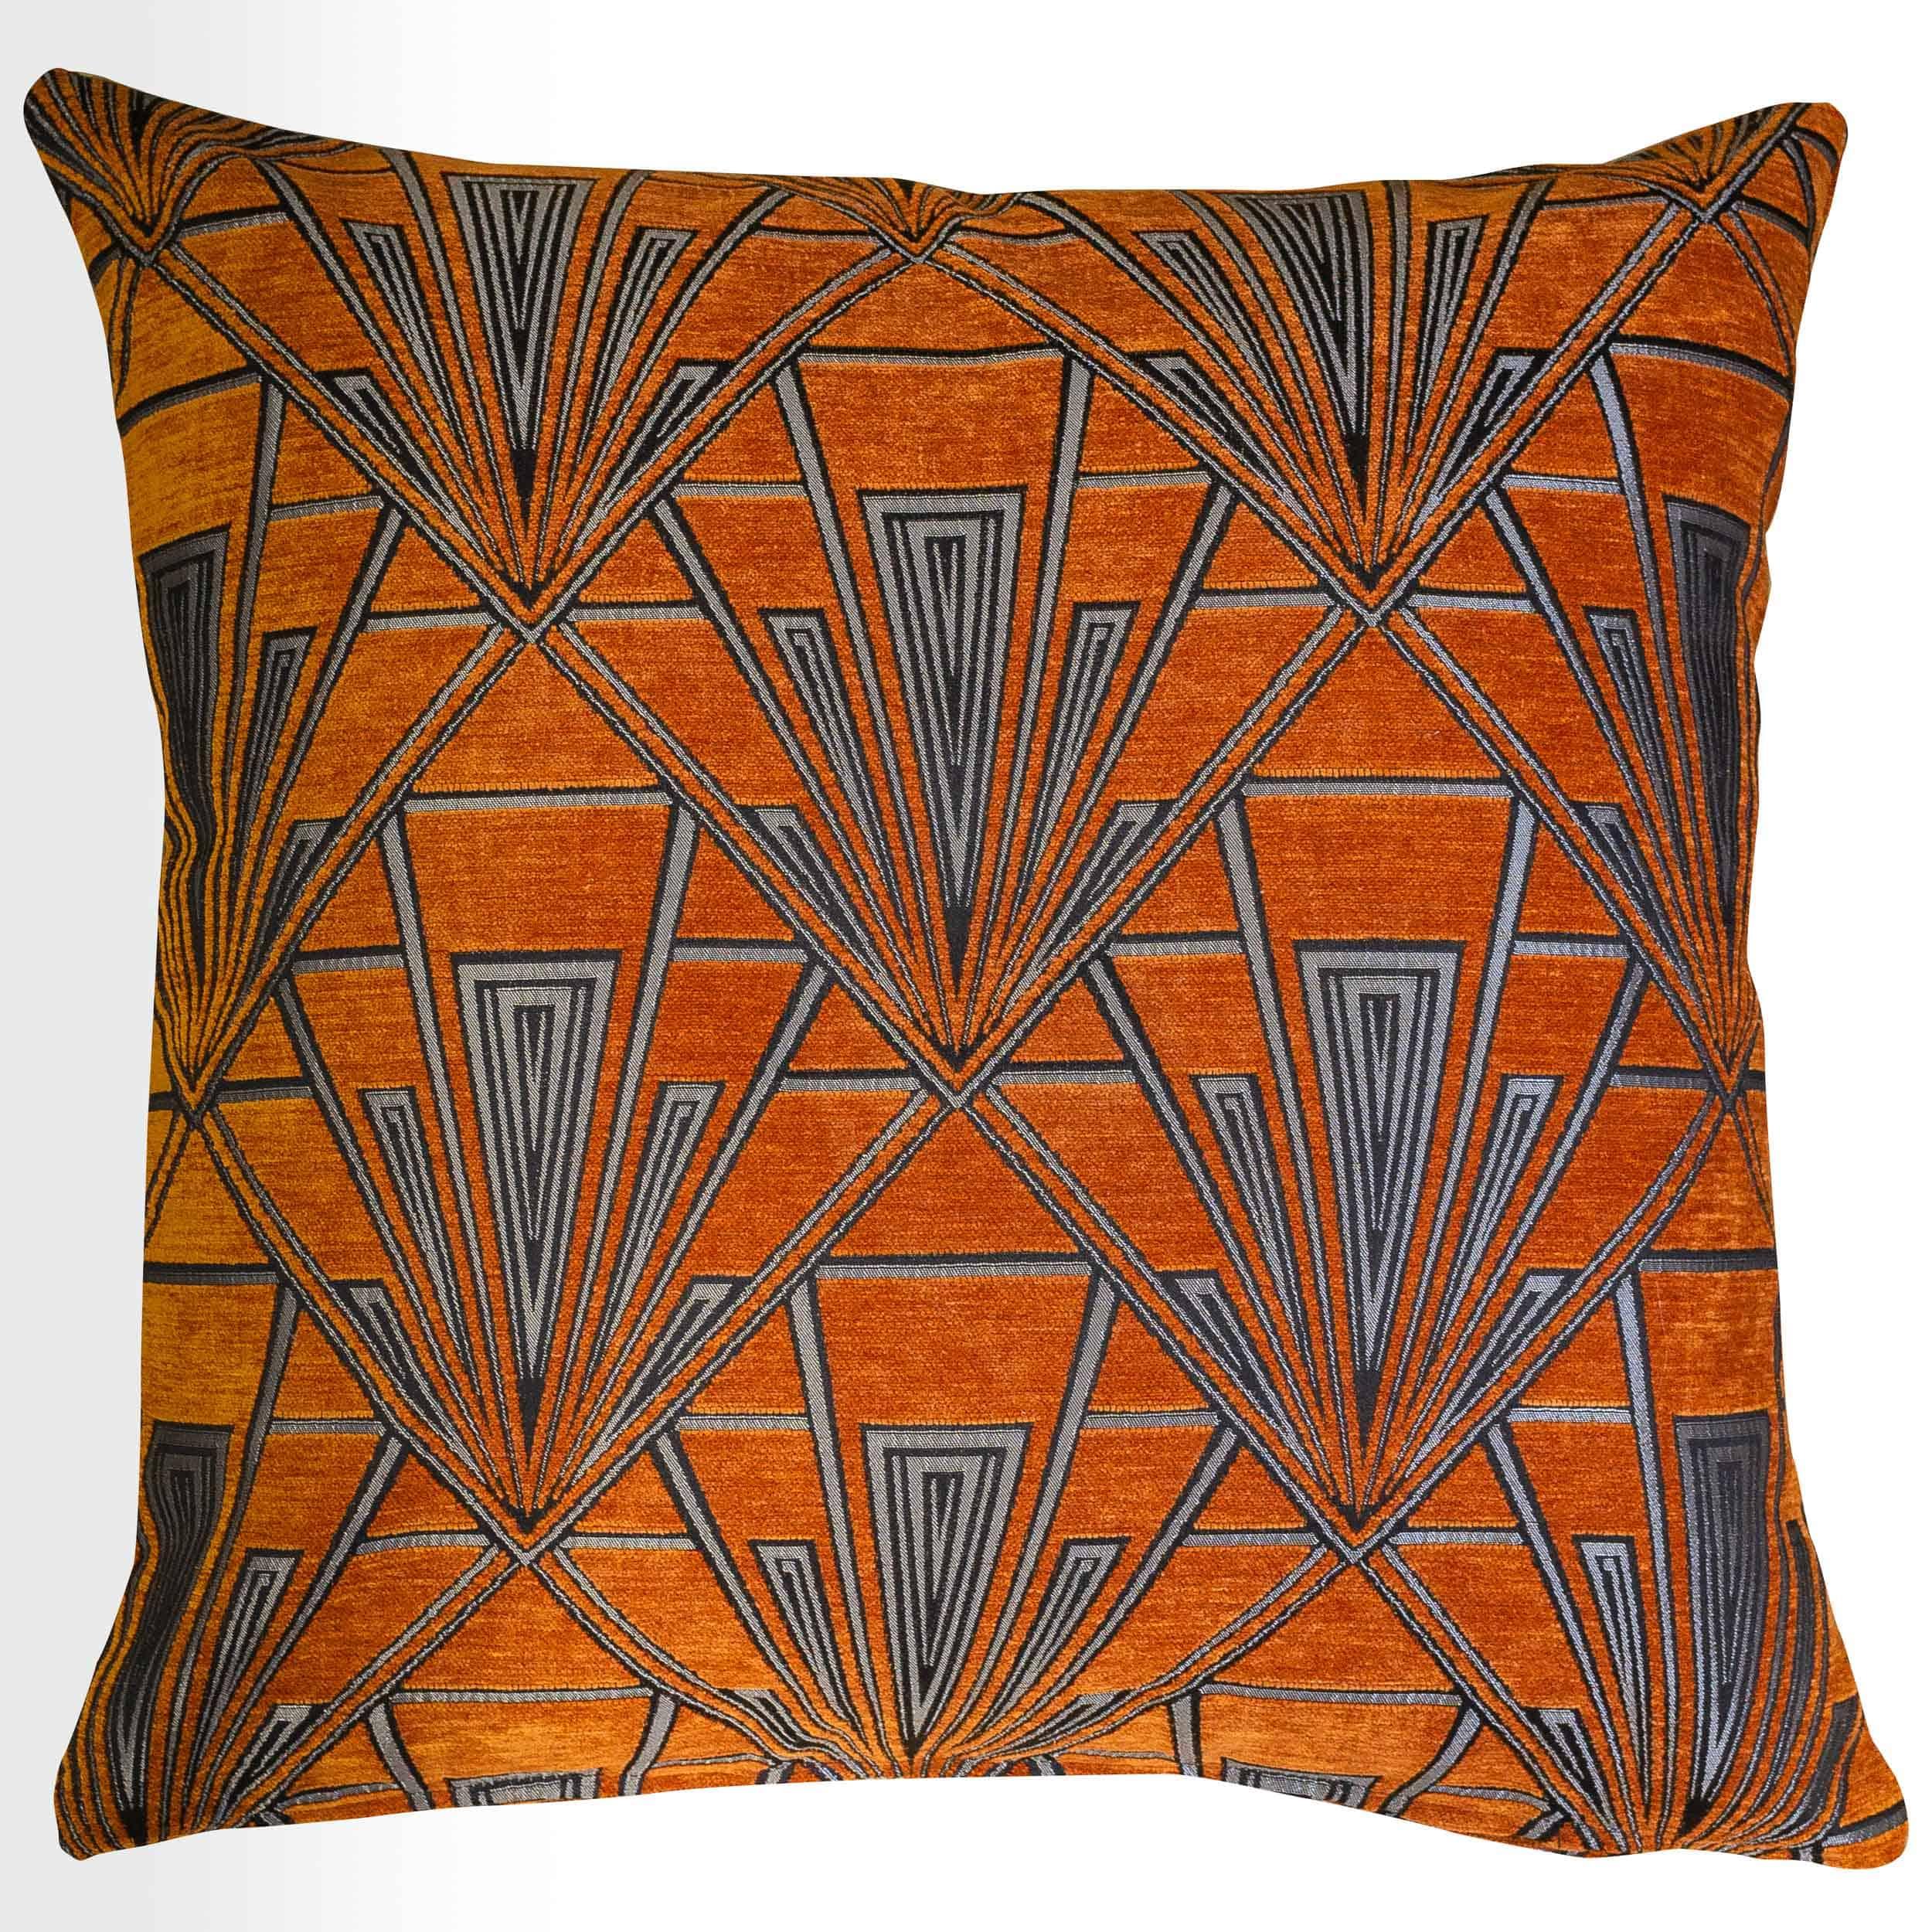 Art Deco Geometric Velvet Chenille Extra-Large Cushion in Burnt Orange and Silver